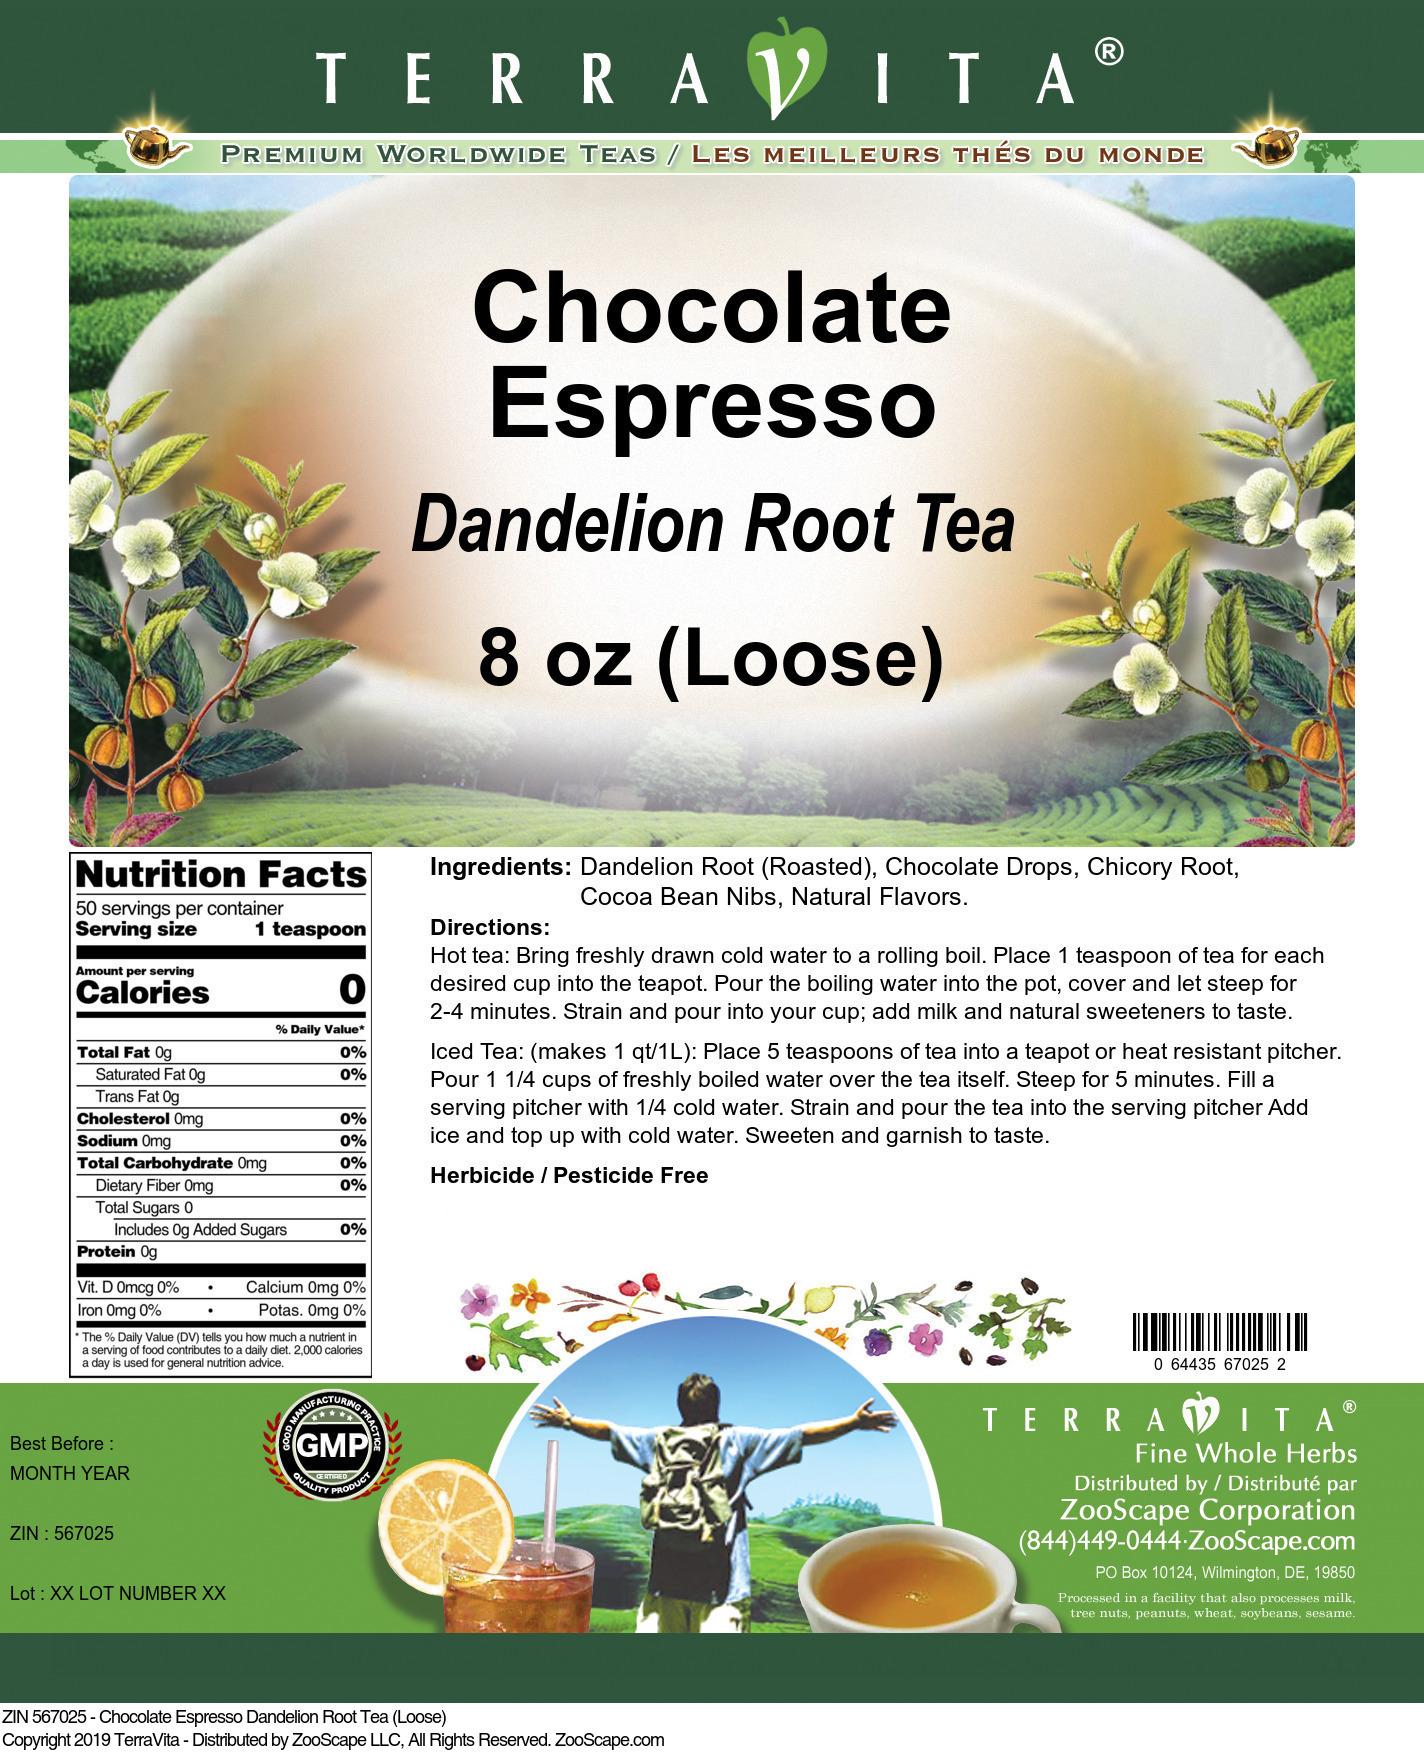 Chocolate Espresso Dandelion Root Tea (Loose)